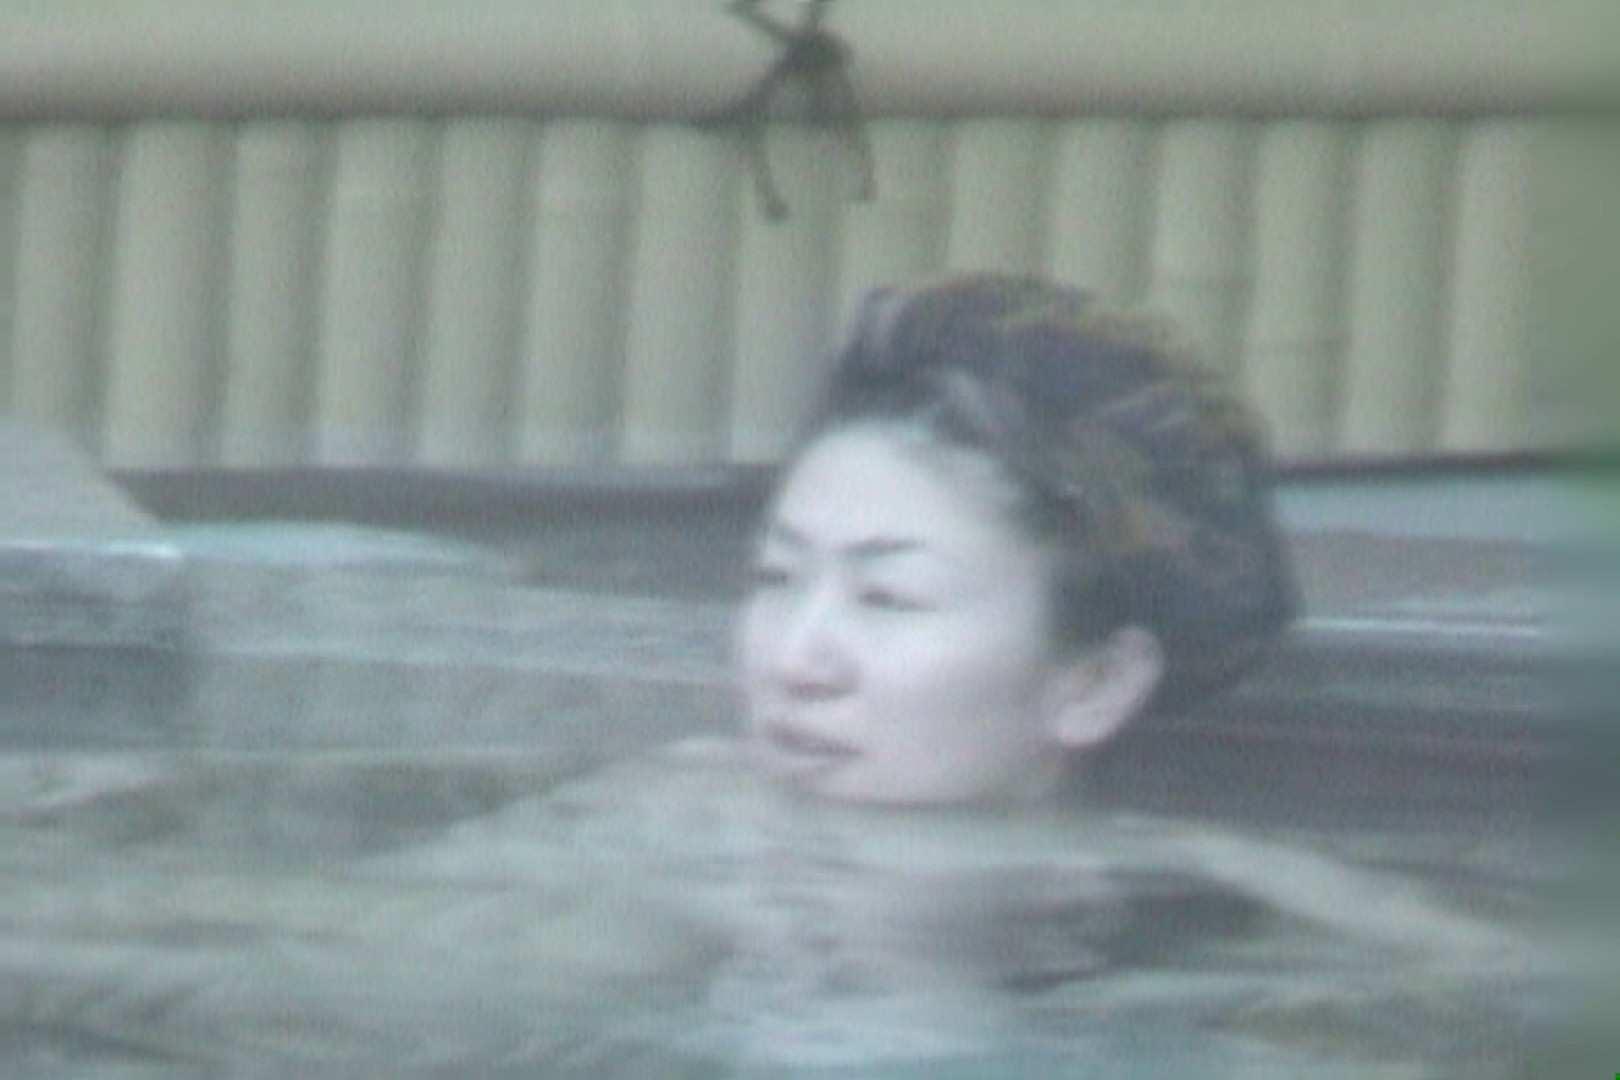 Aquaな露天風呂Vol.607 OL女体 盗み撮り動画キャプチャ 56連発 20